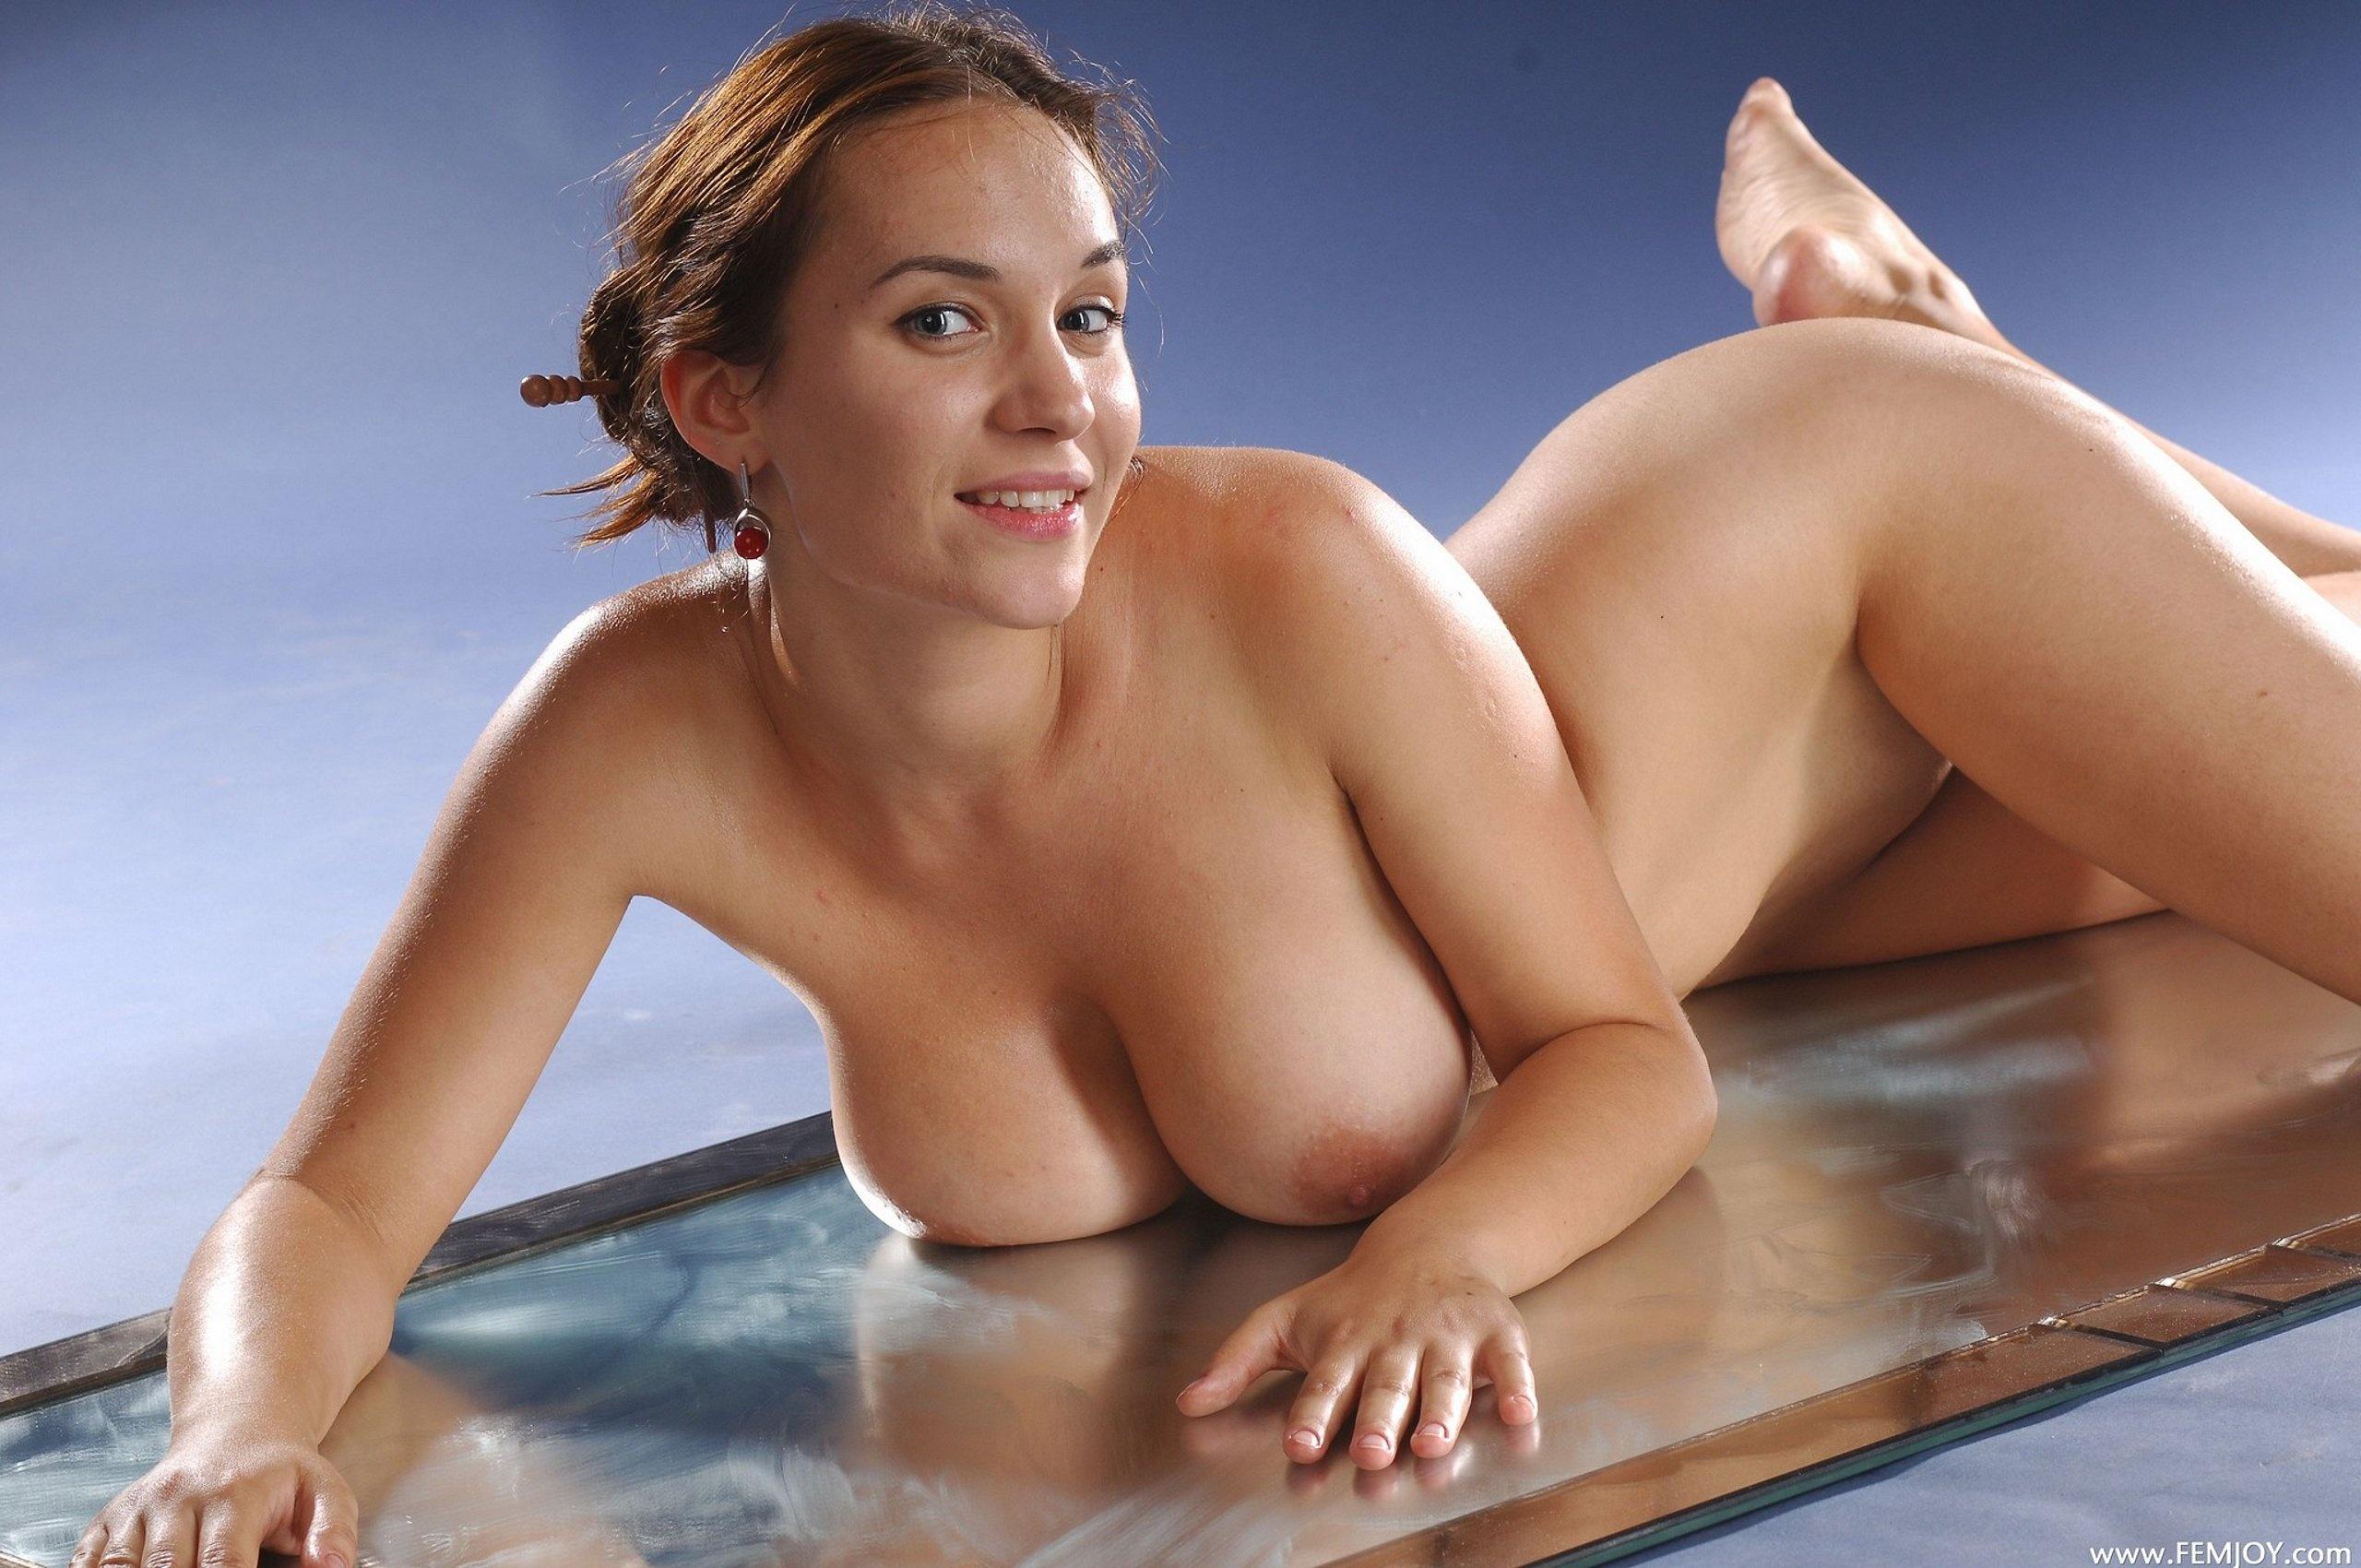 Wallpaper Chesney, Brunette, Nude, Naked, Beauty, Big -4305